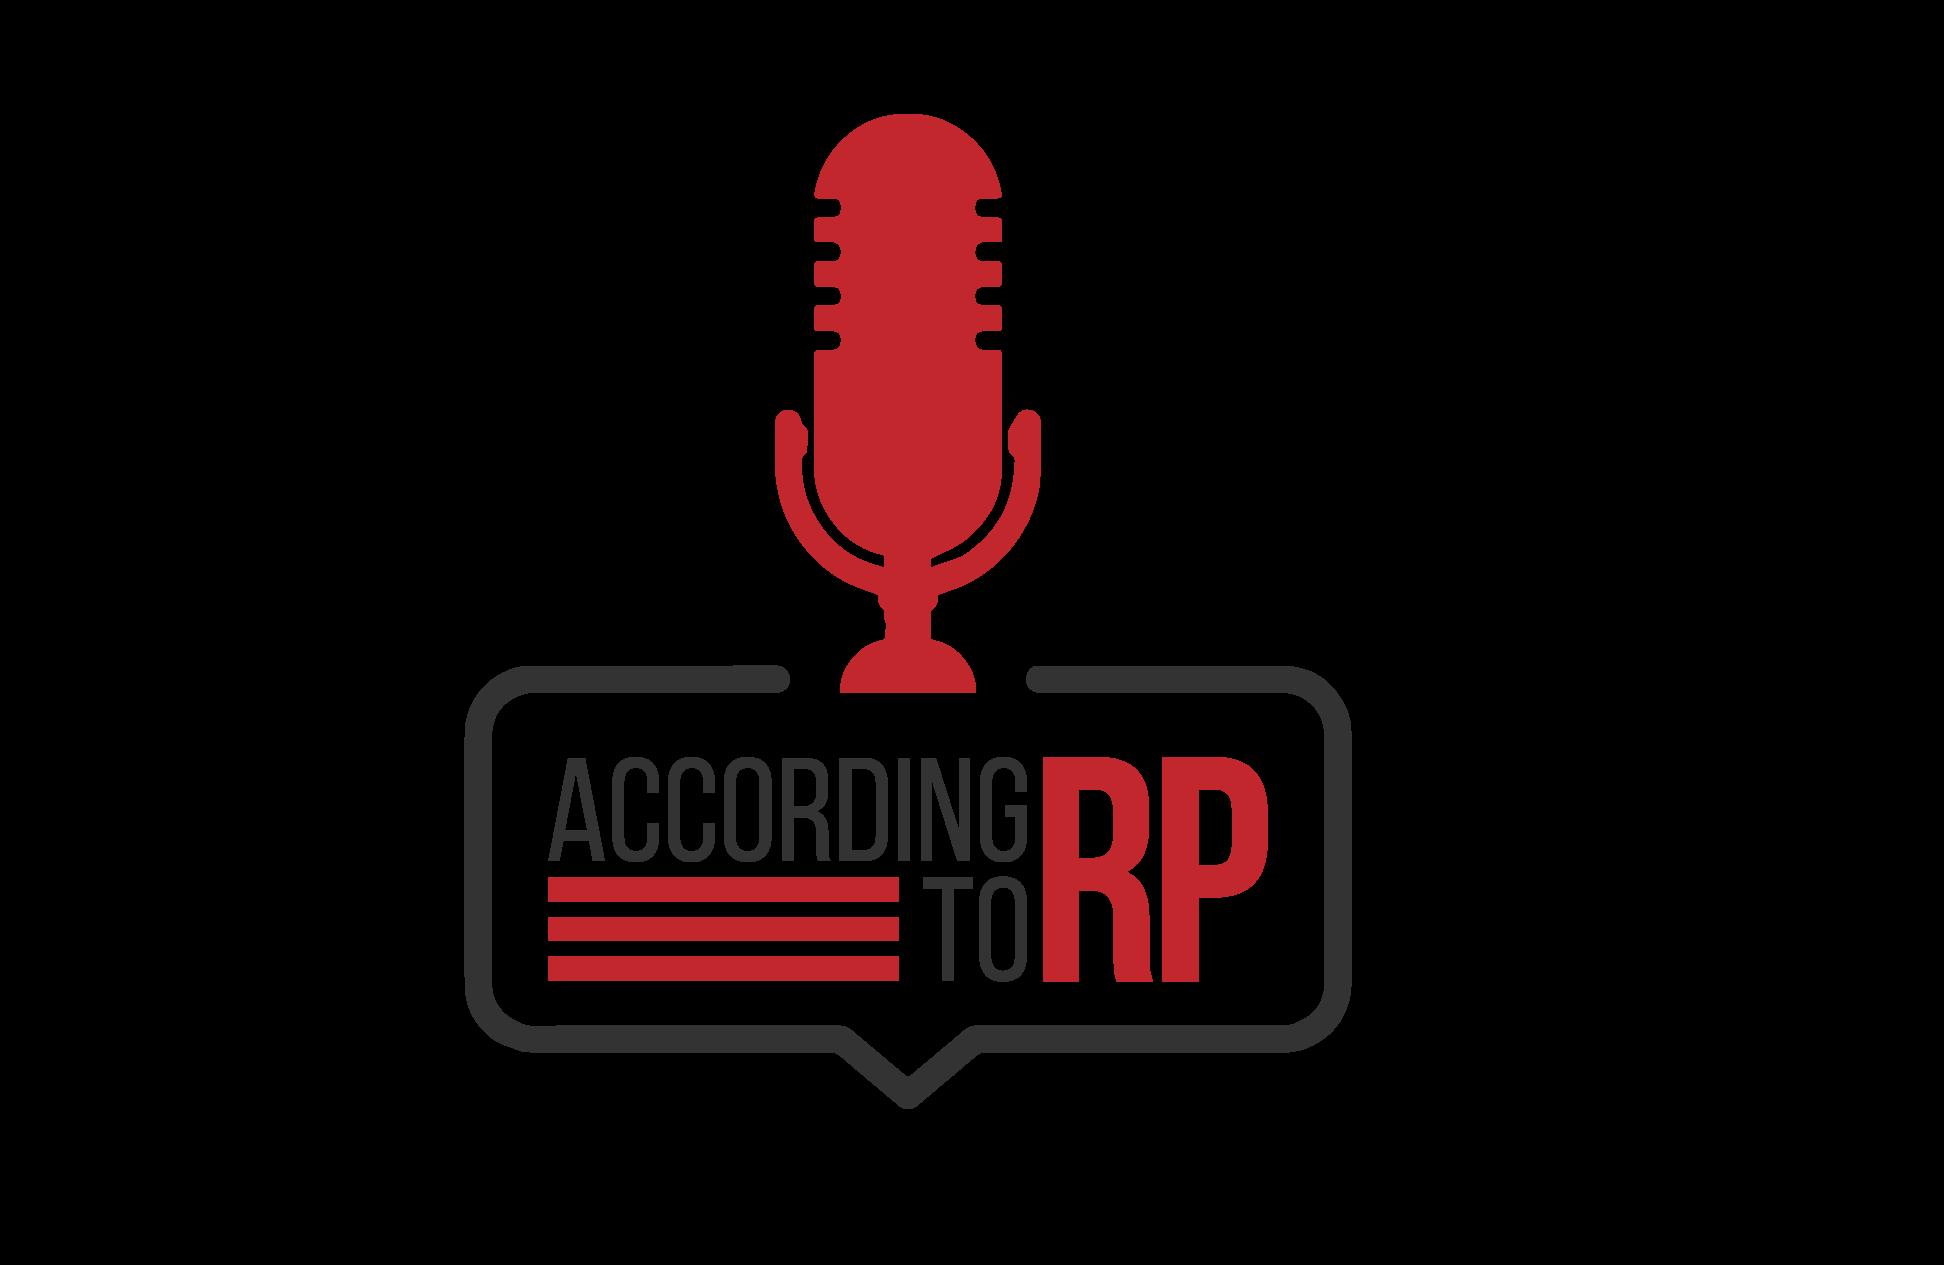 According To RP Logo September 19, 2020